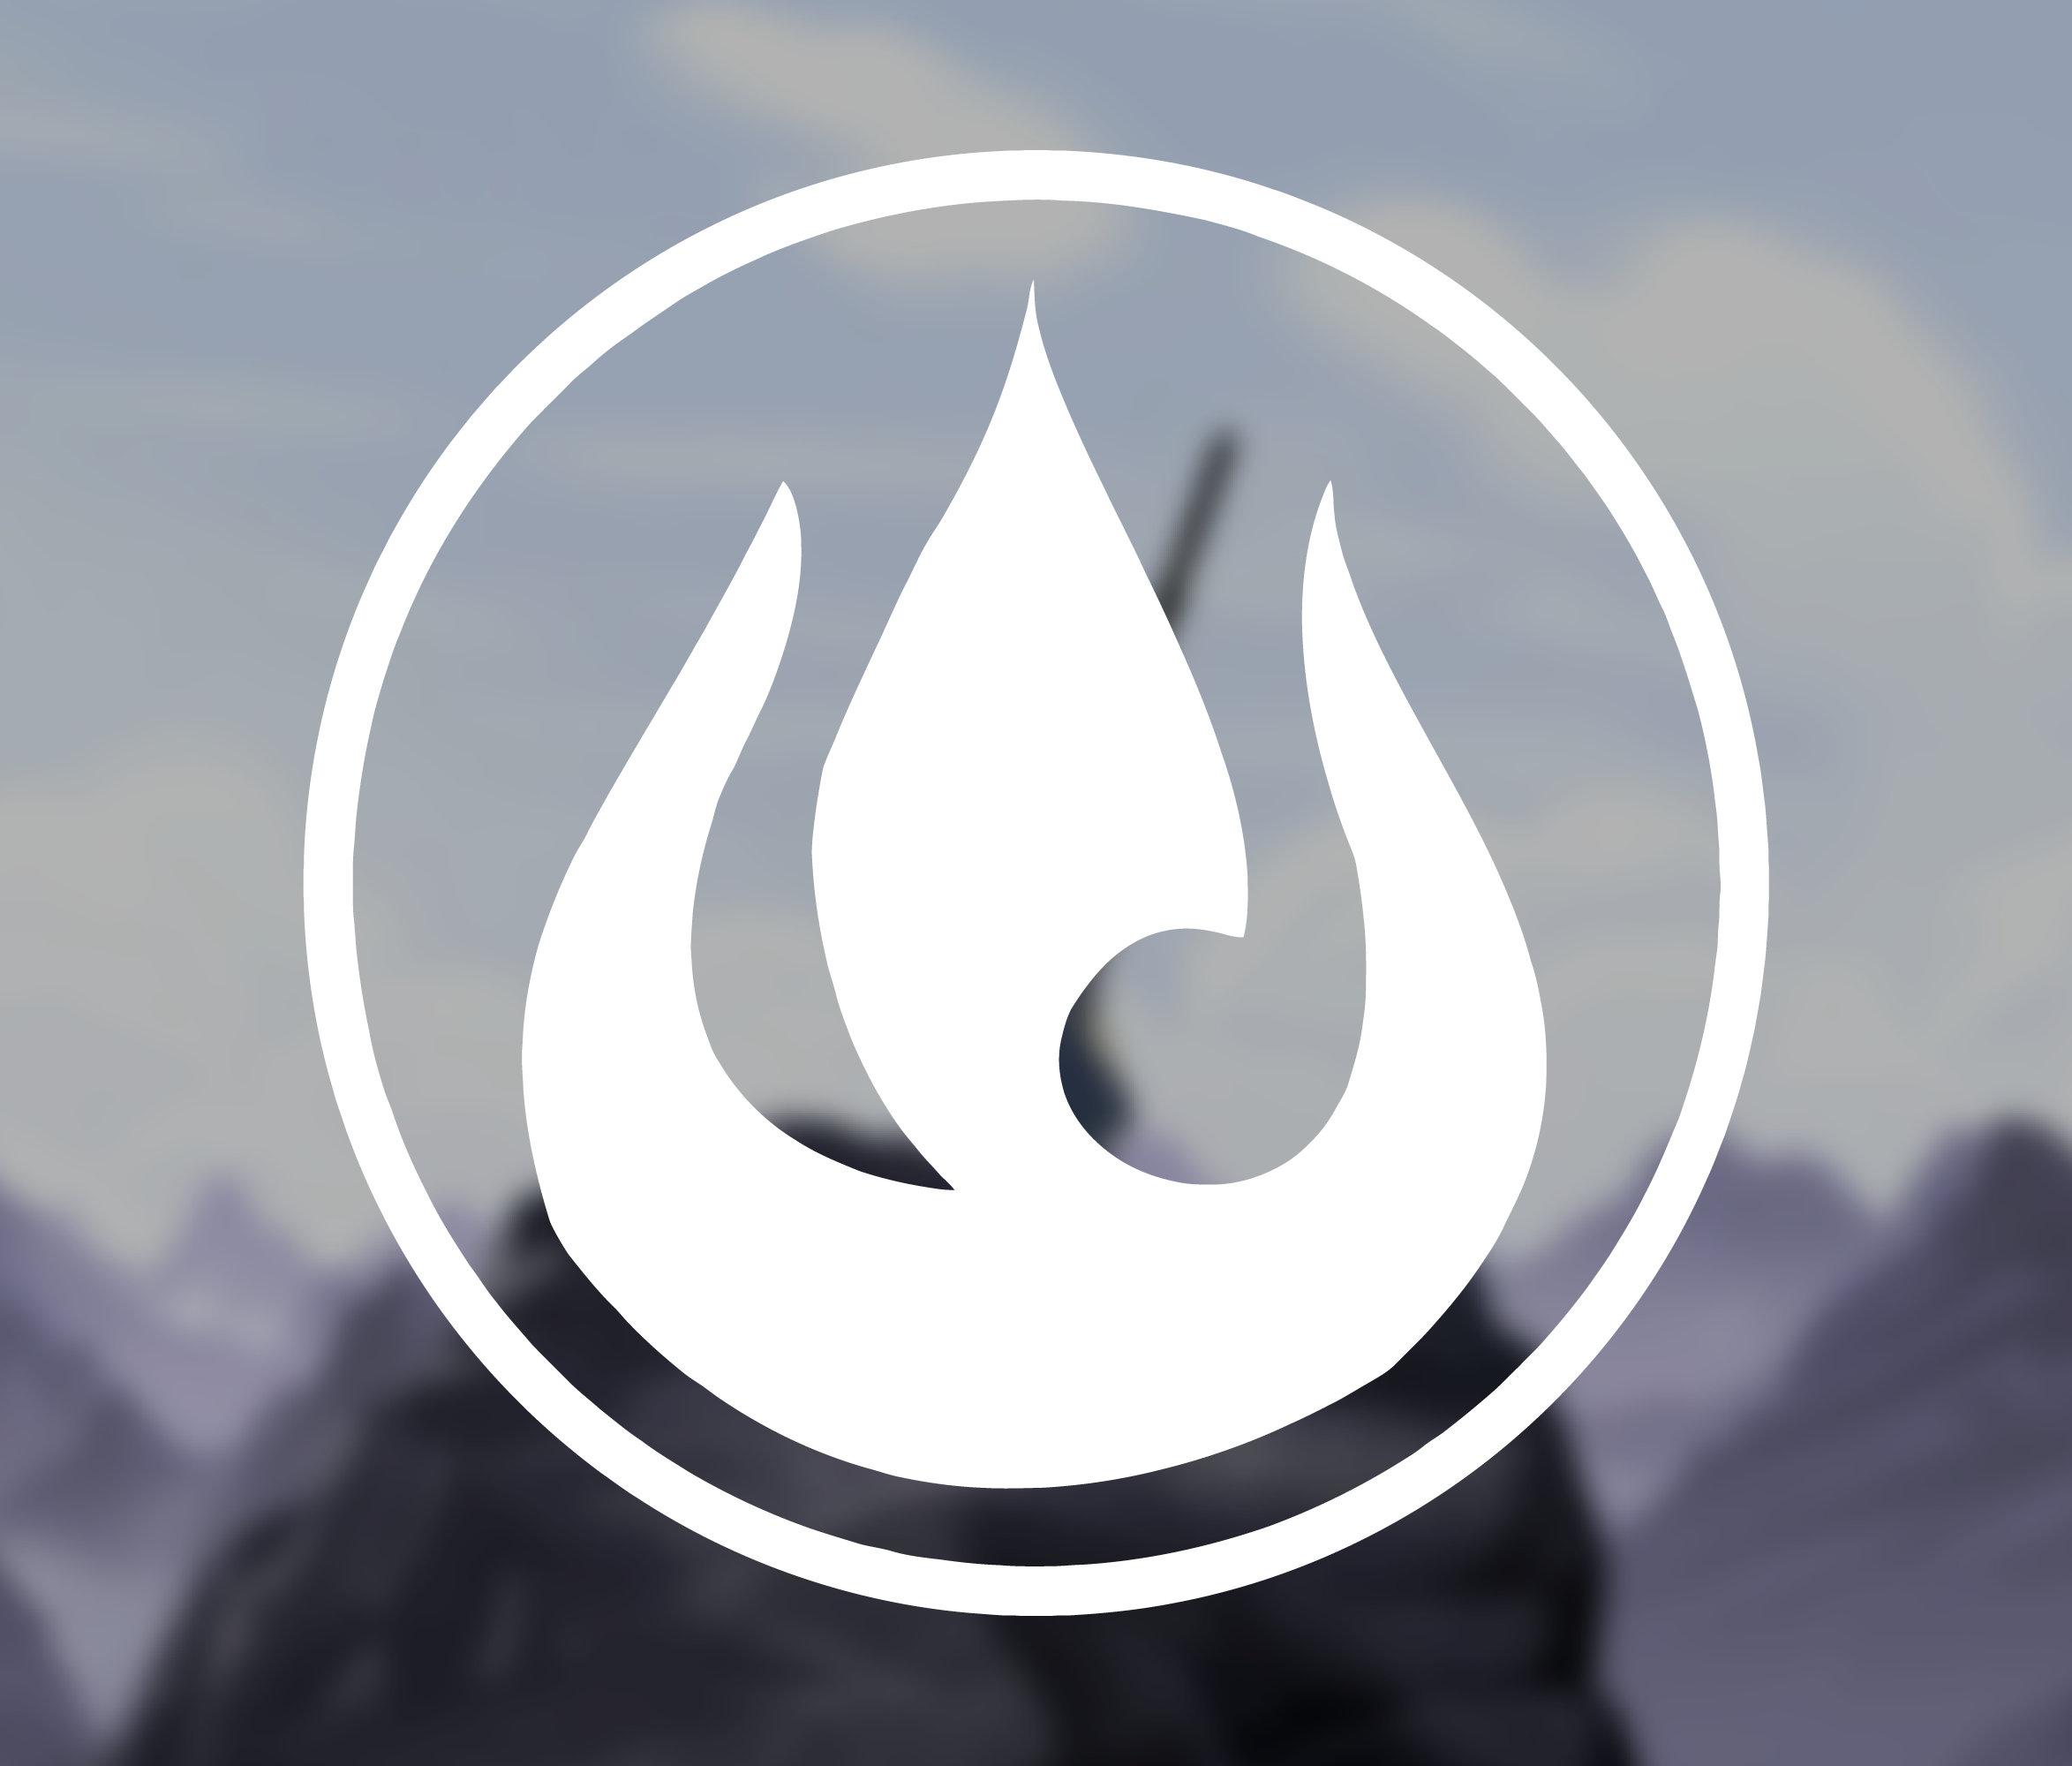 Avatar The Last Airbender   Fire Nation Symbol   Aufkleber   ATLA